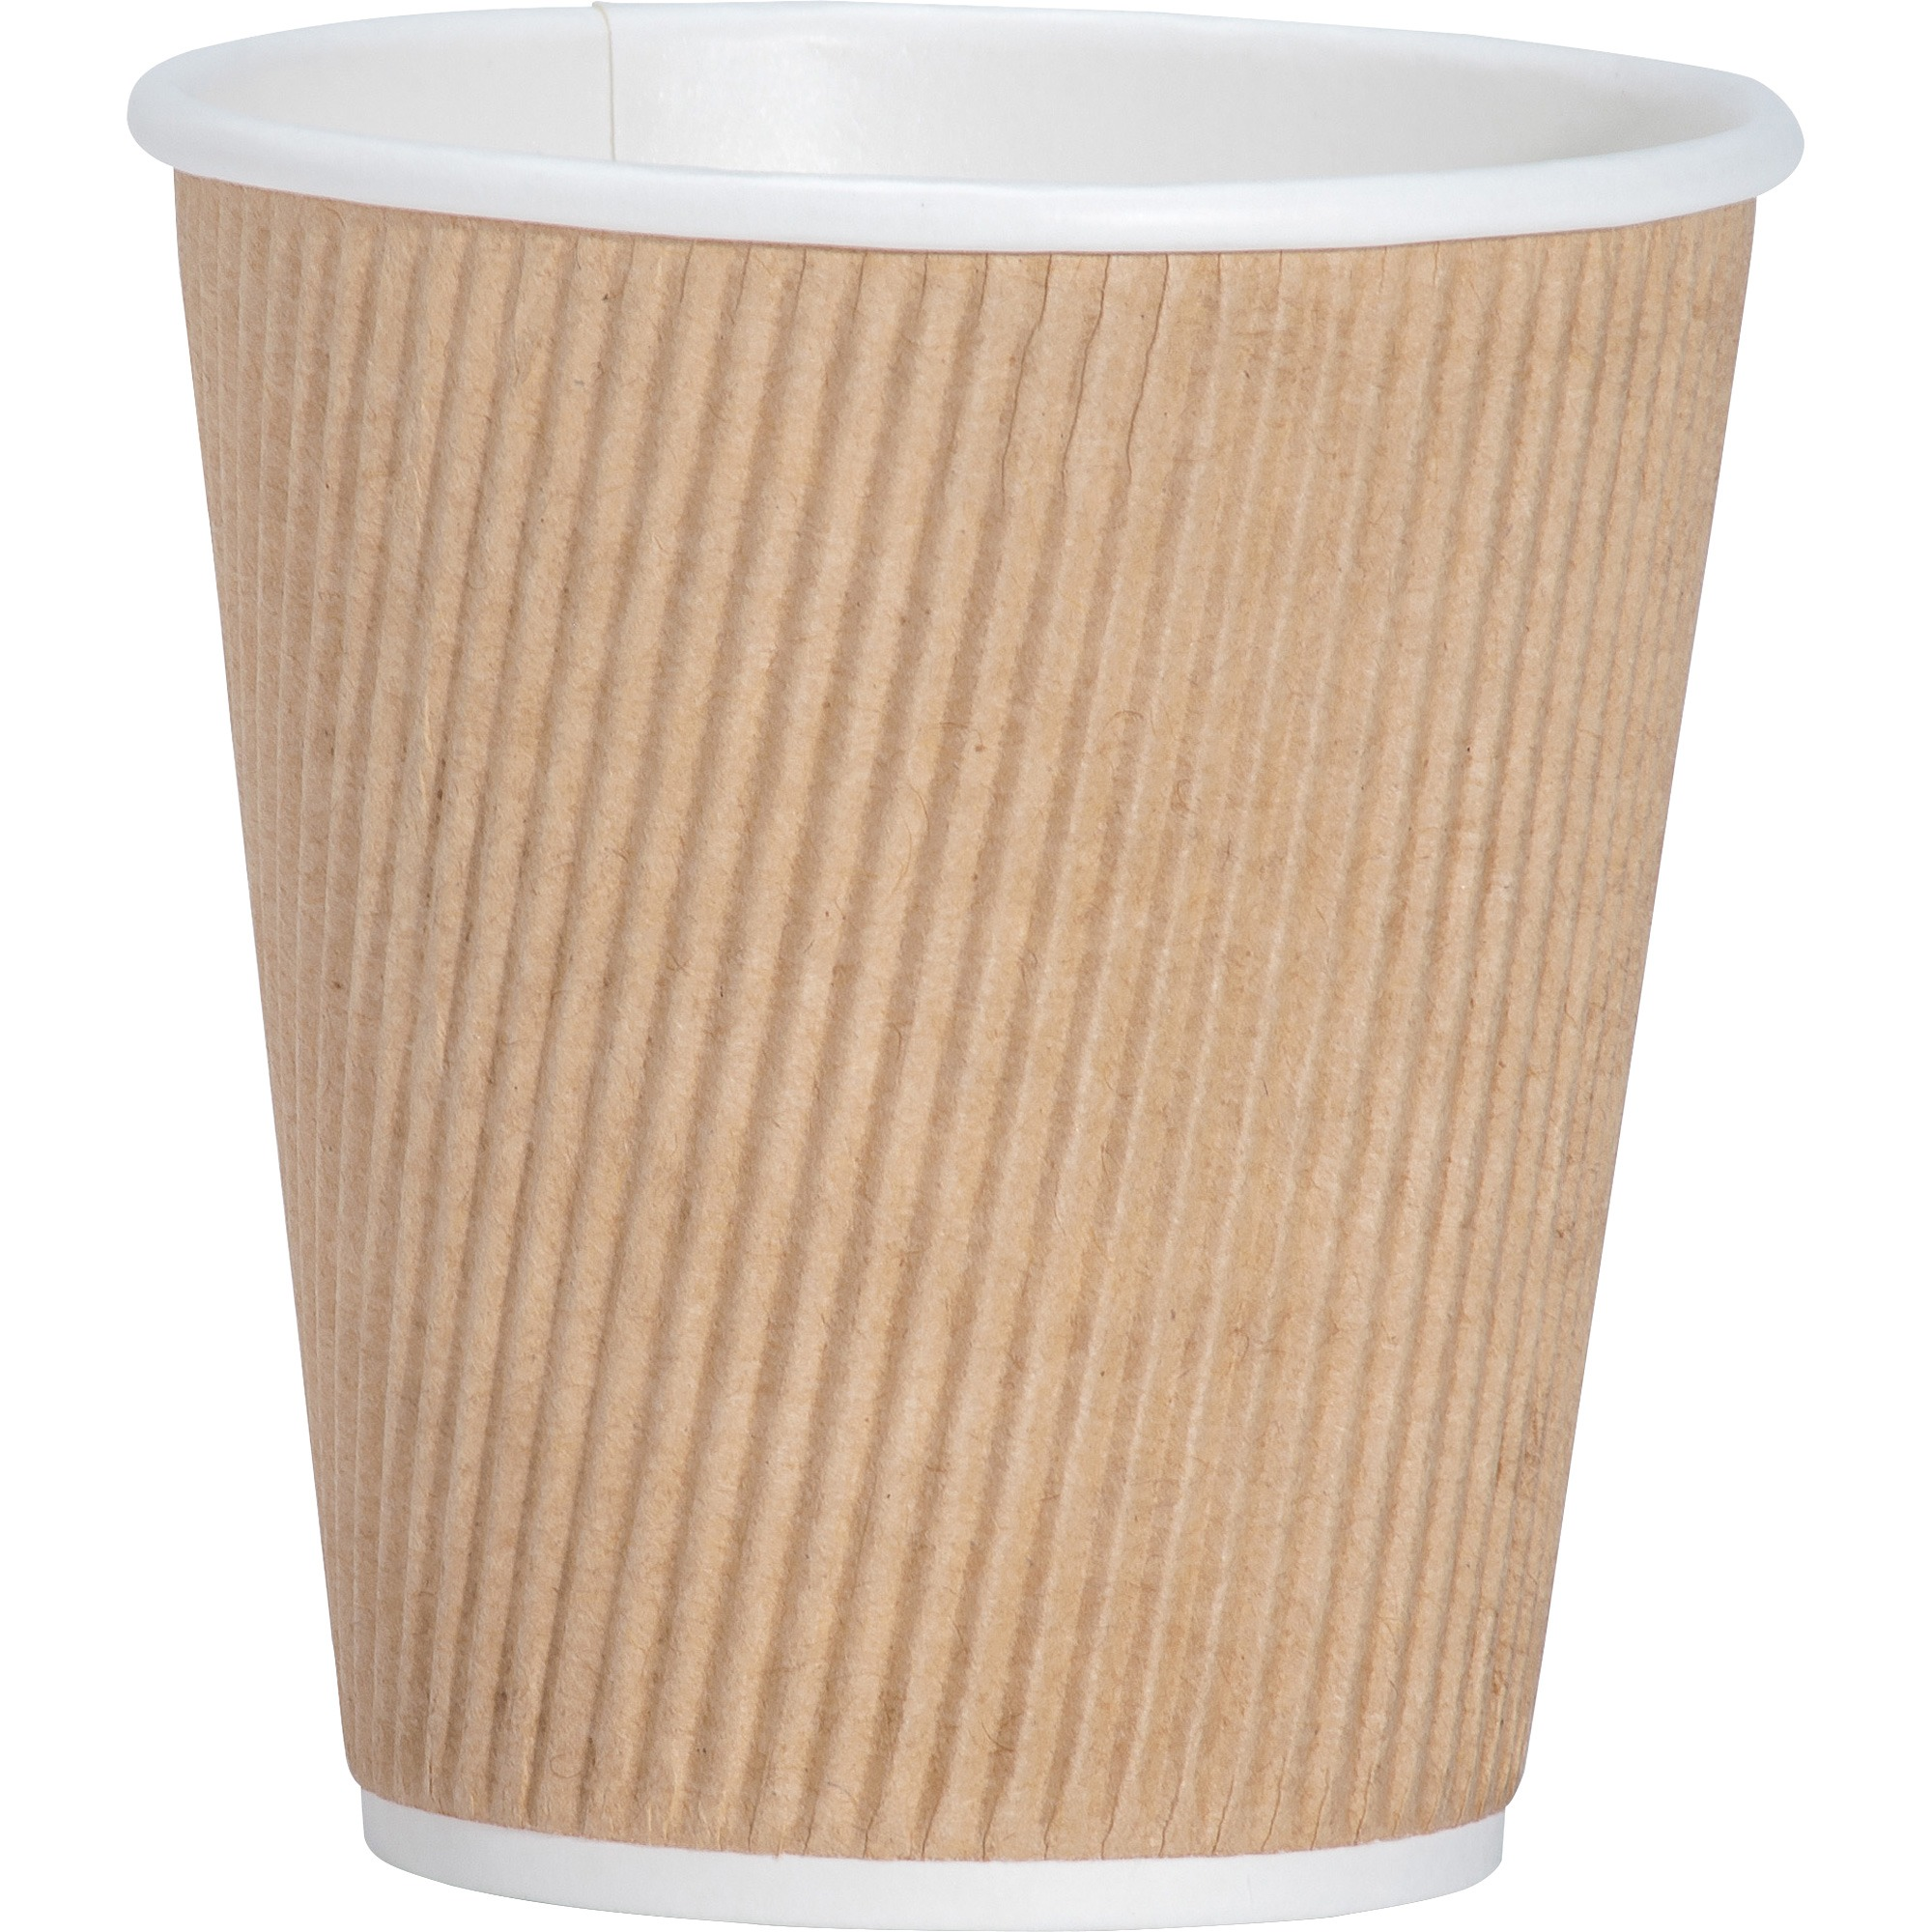 Genuine Joe Rippled Hot Cup,  10oz.,  500/CT,  Brown - GJO11256CT